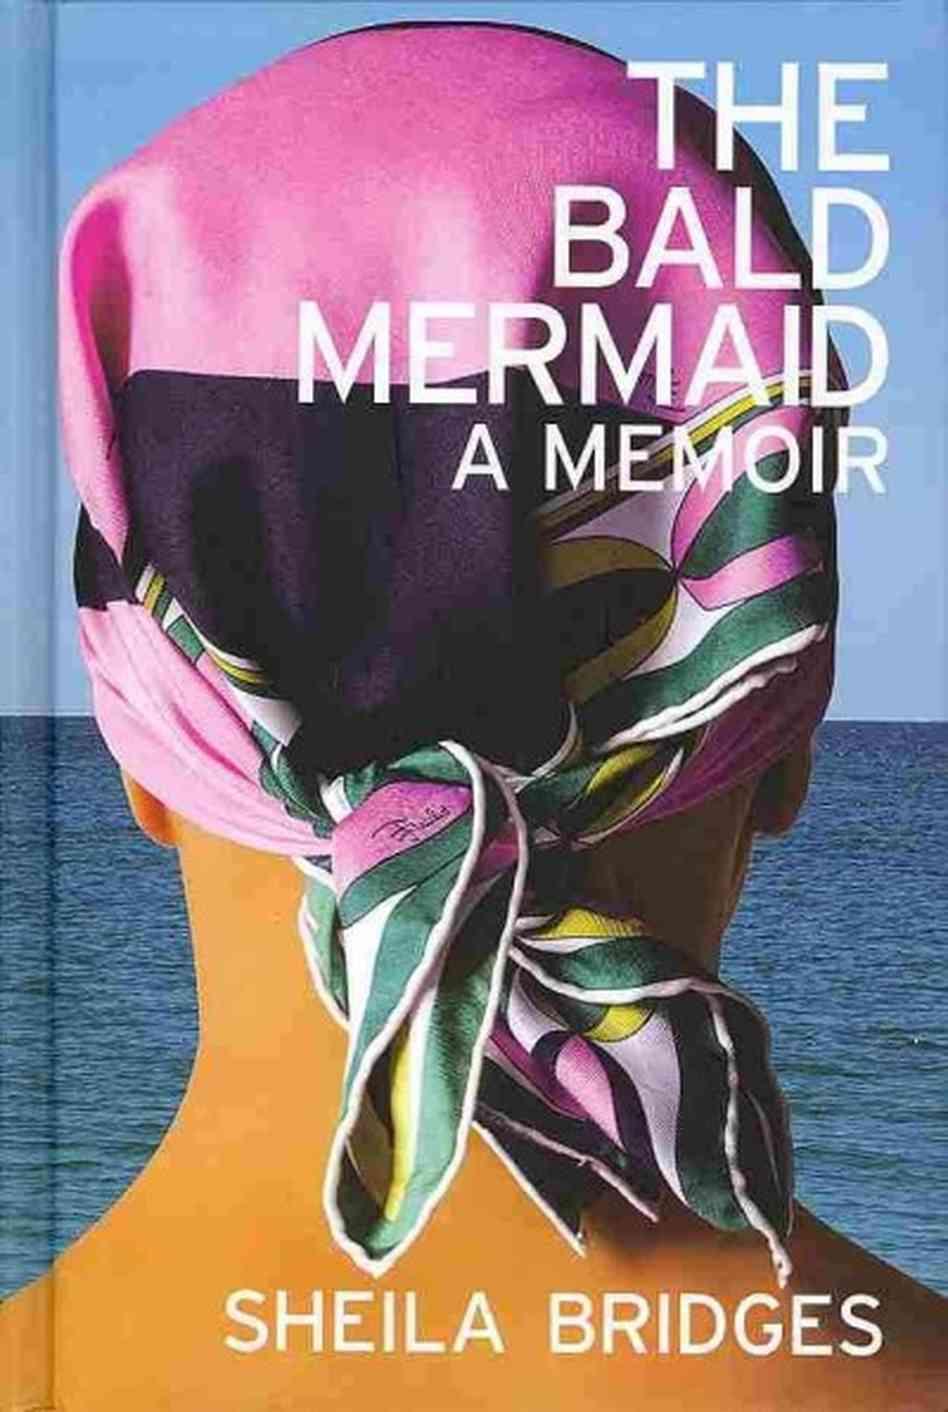 Bald Headed Mermaid Book Signing